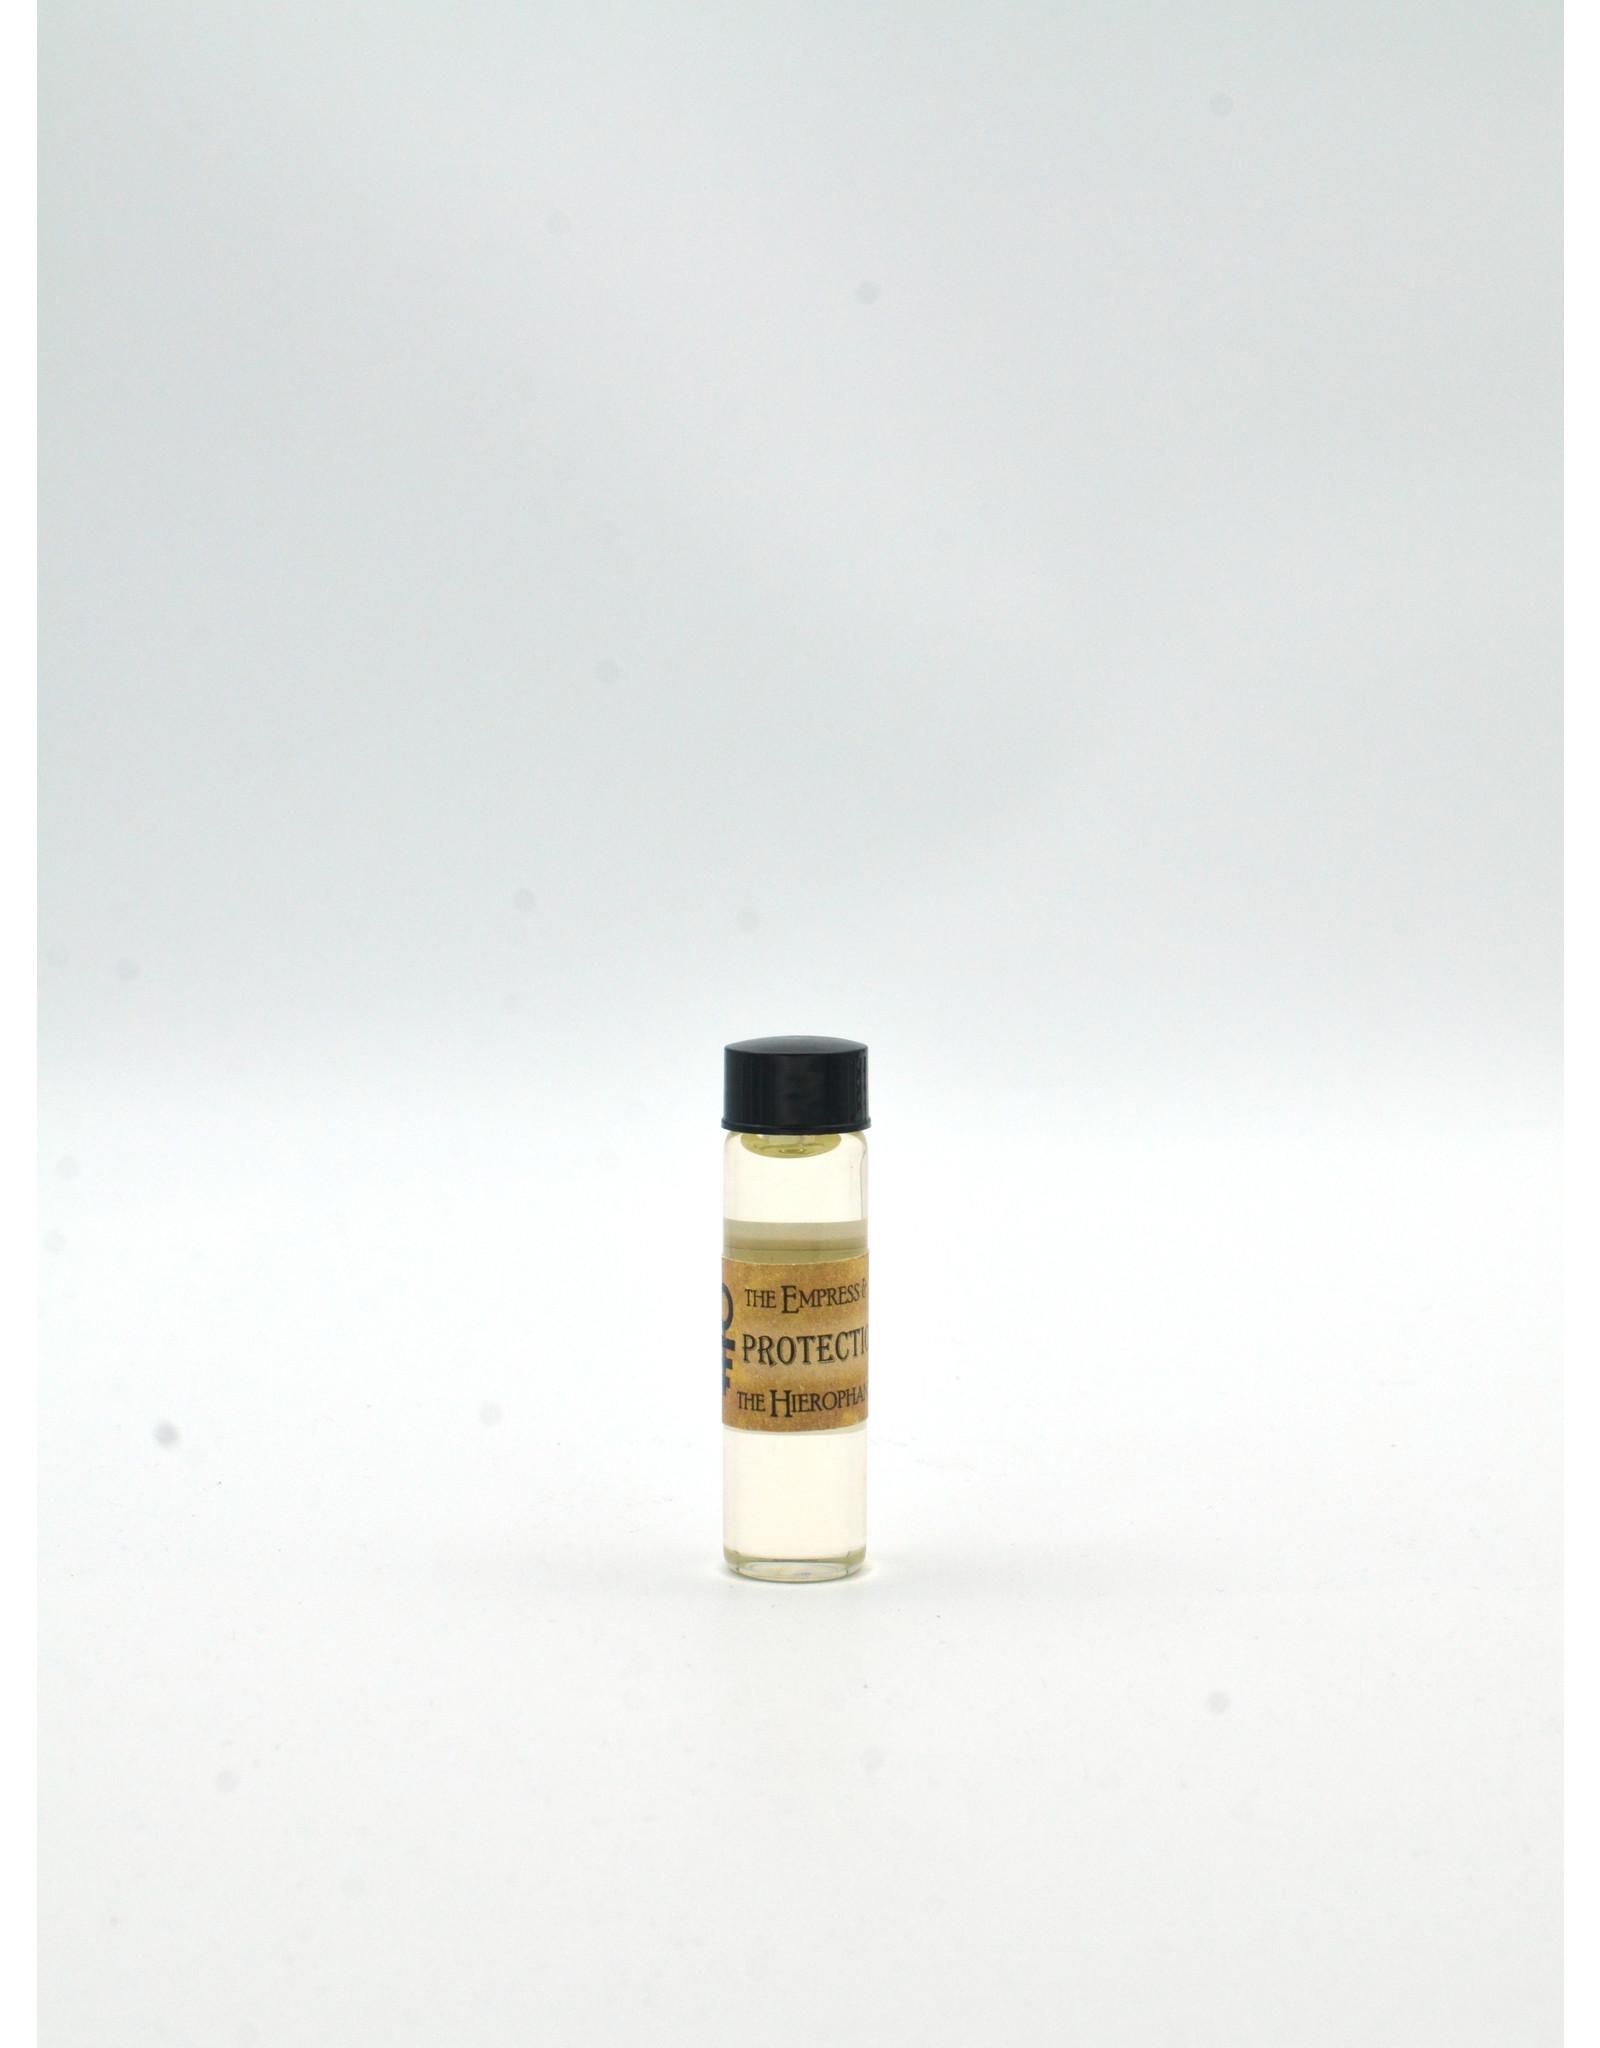 Protection Magickal Oil 2 Dram Bottle